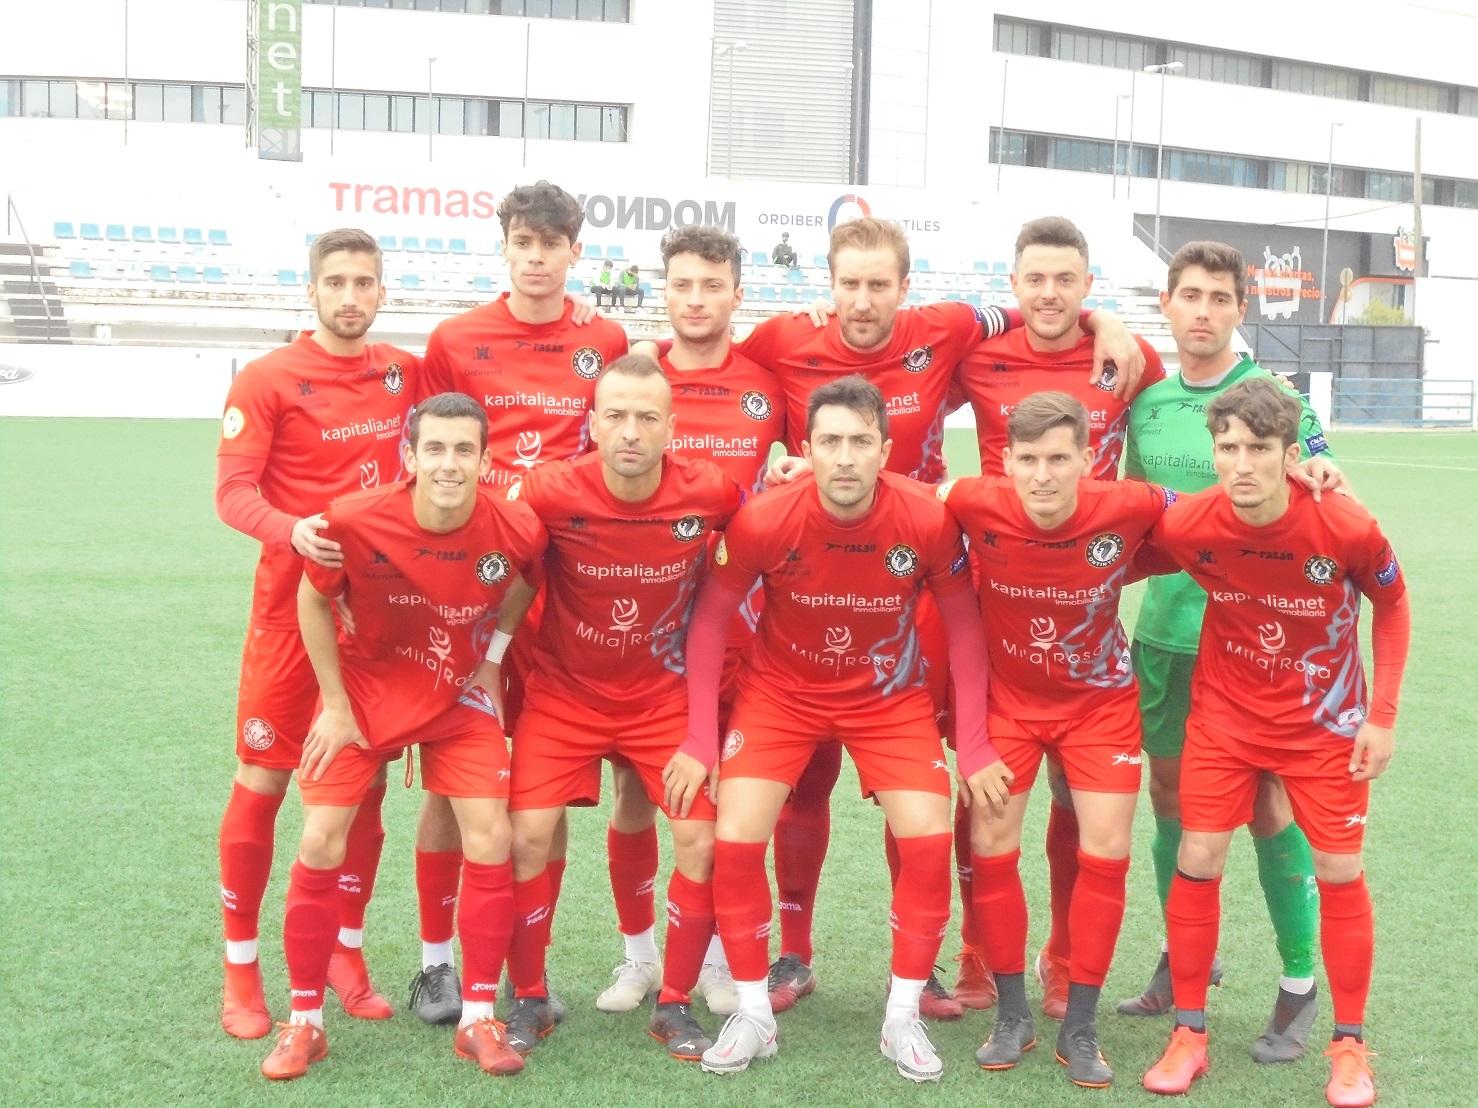 Ontinyent 1931 4-1 Deportivo Ontinyent